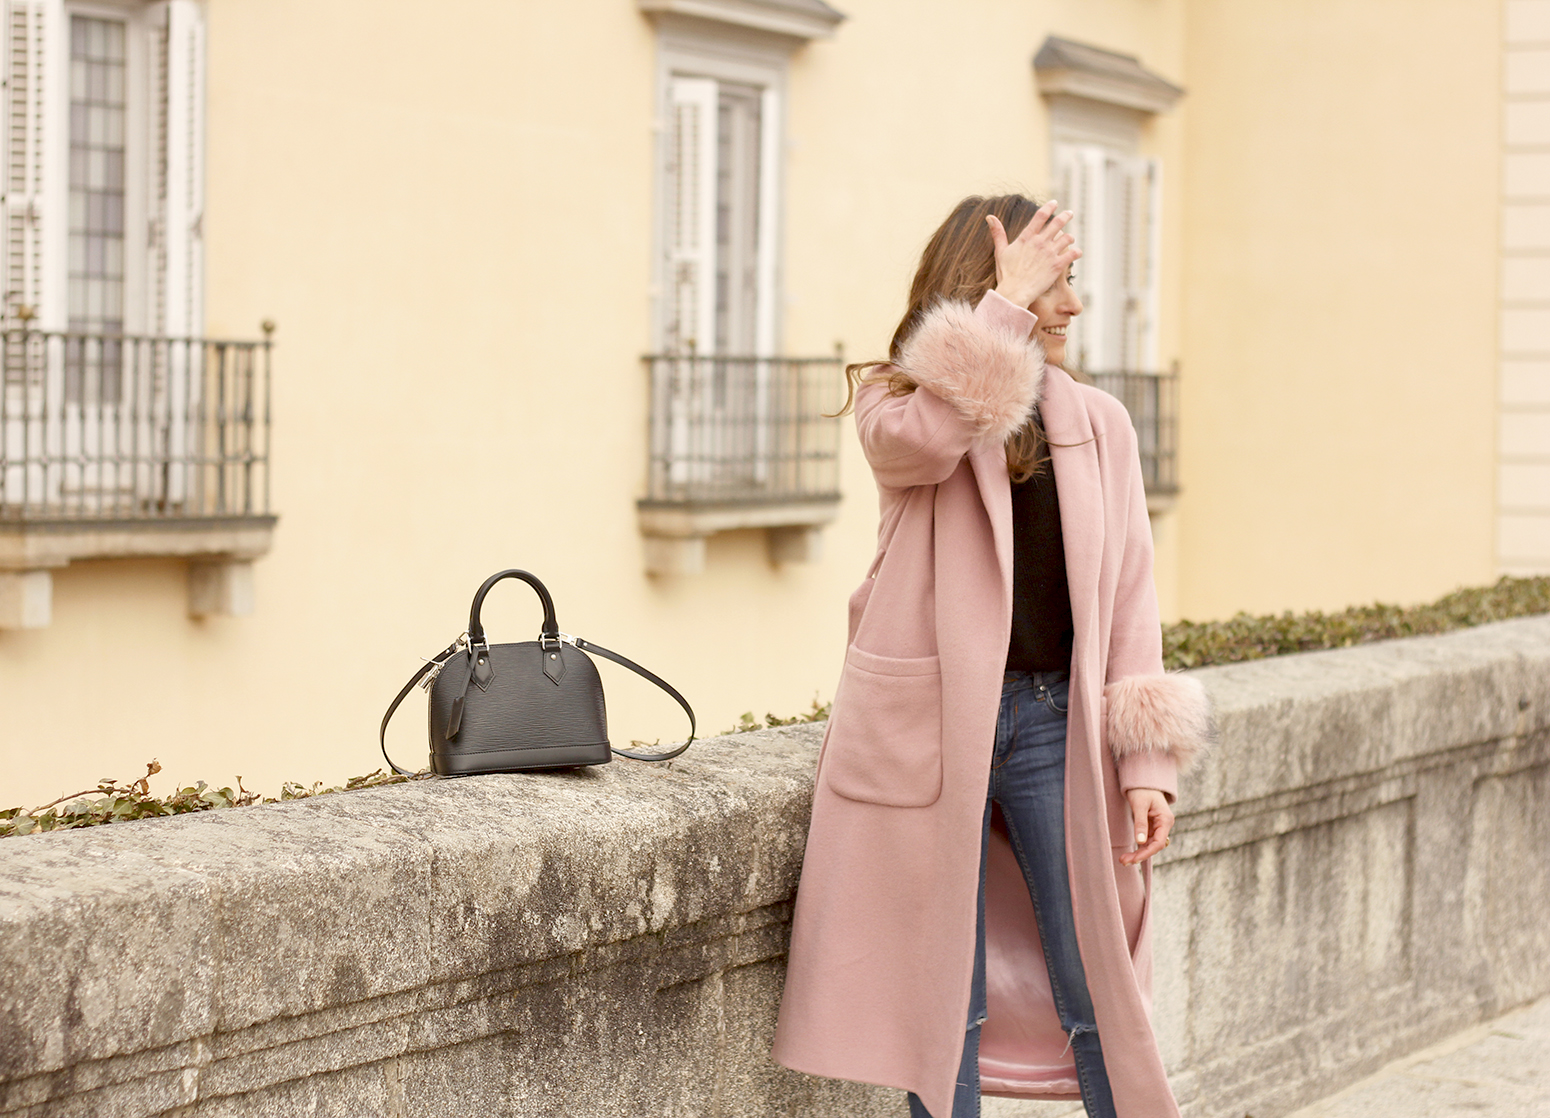 pink coat byleclair carolina herrera heels jeans louis vuitton ba street style outfit 20198